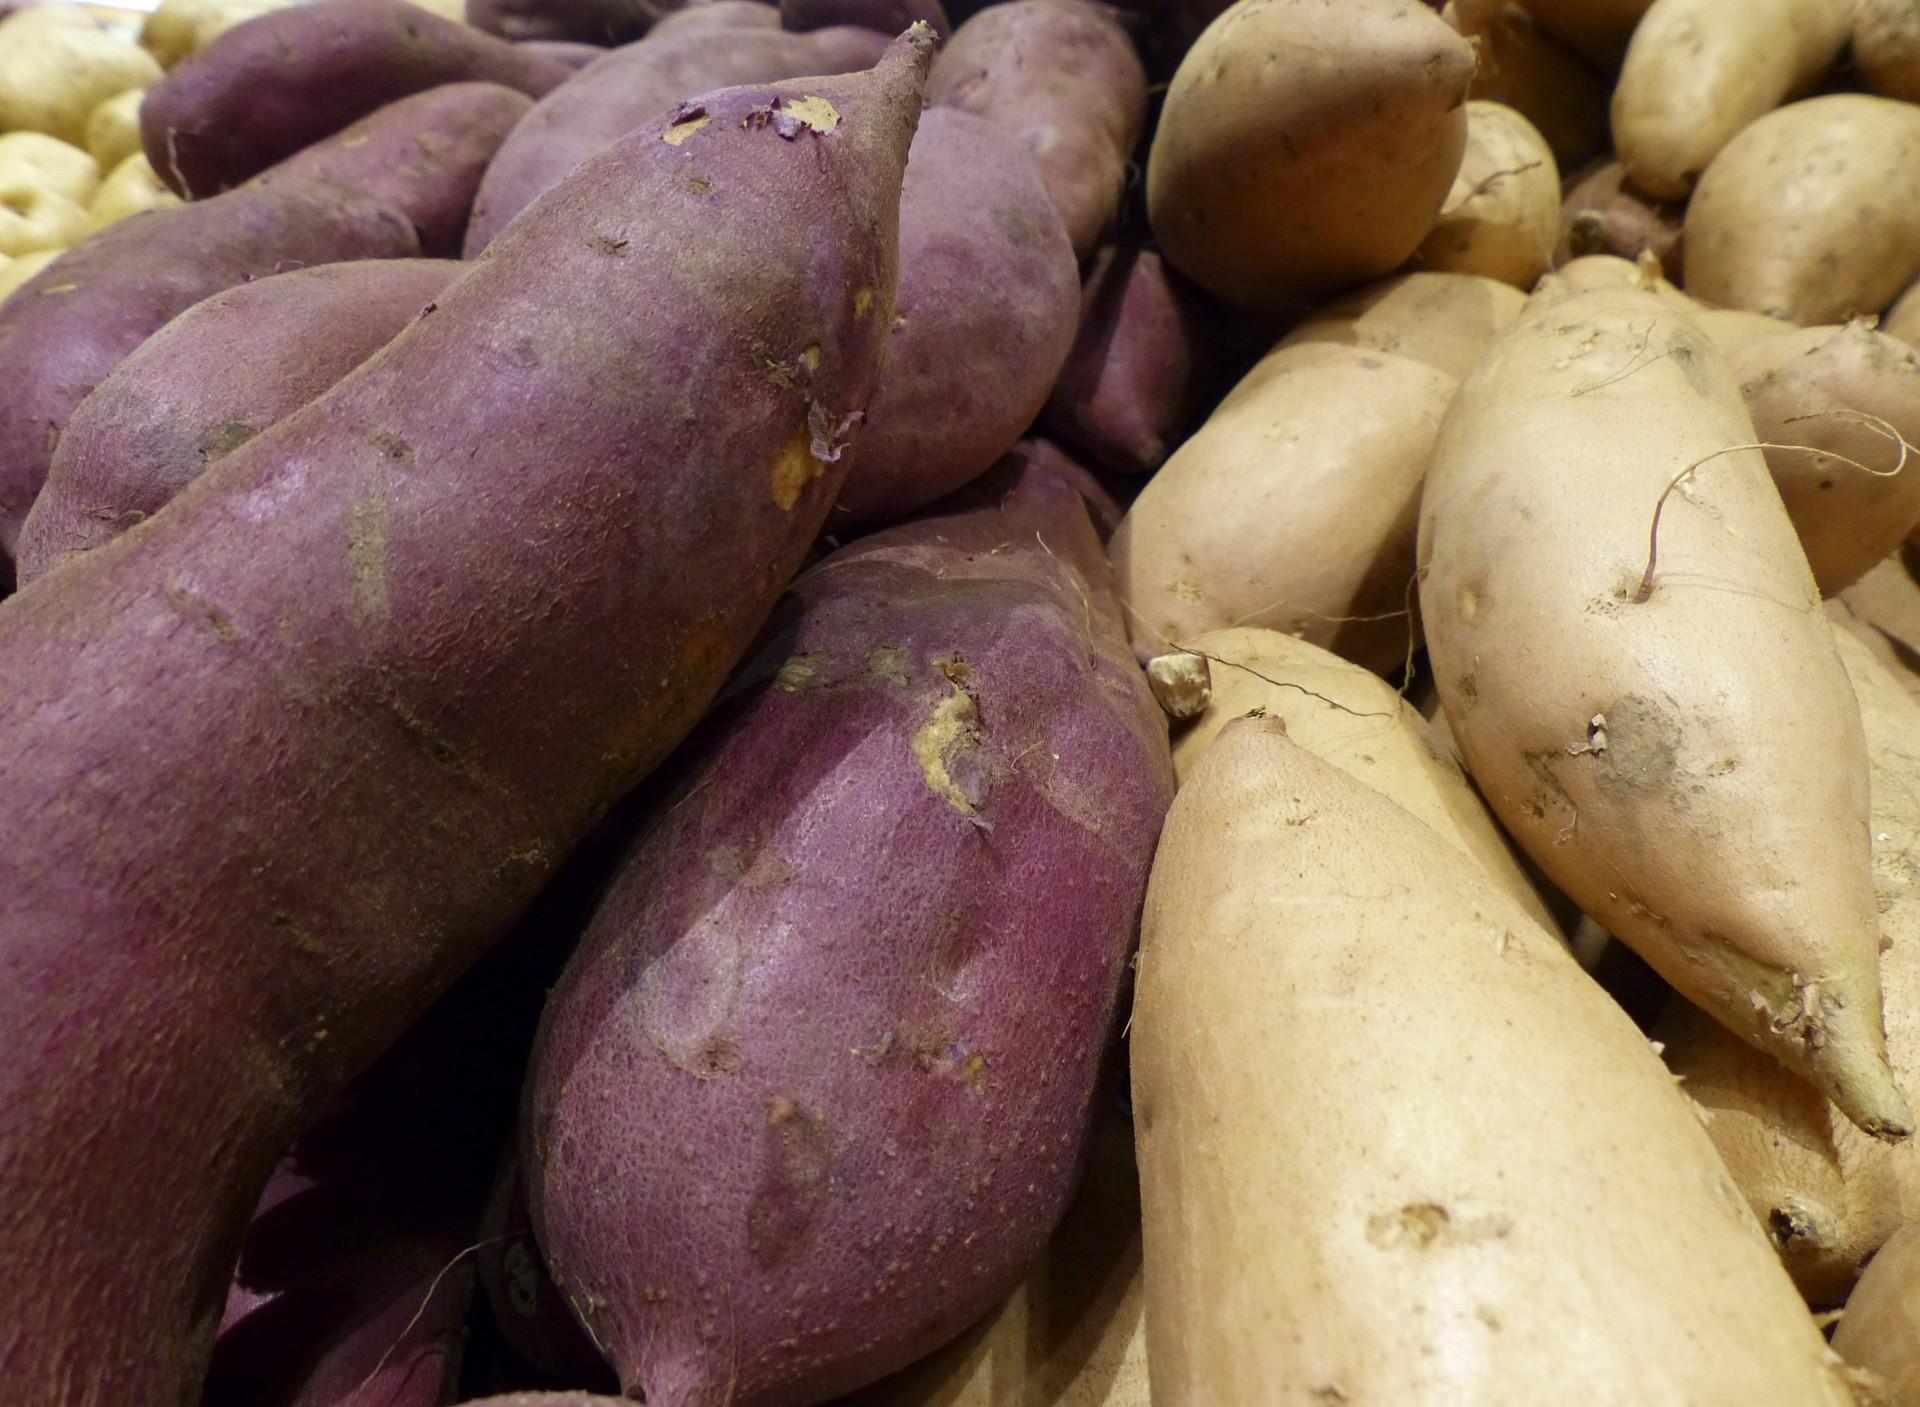 Yams,fresh,produce,market,thanksgiving - free image from needpix.com